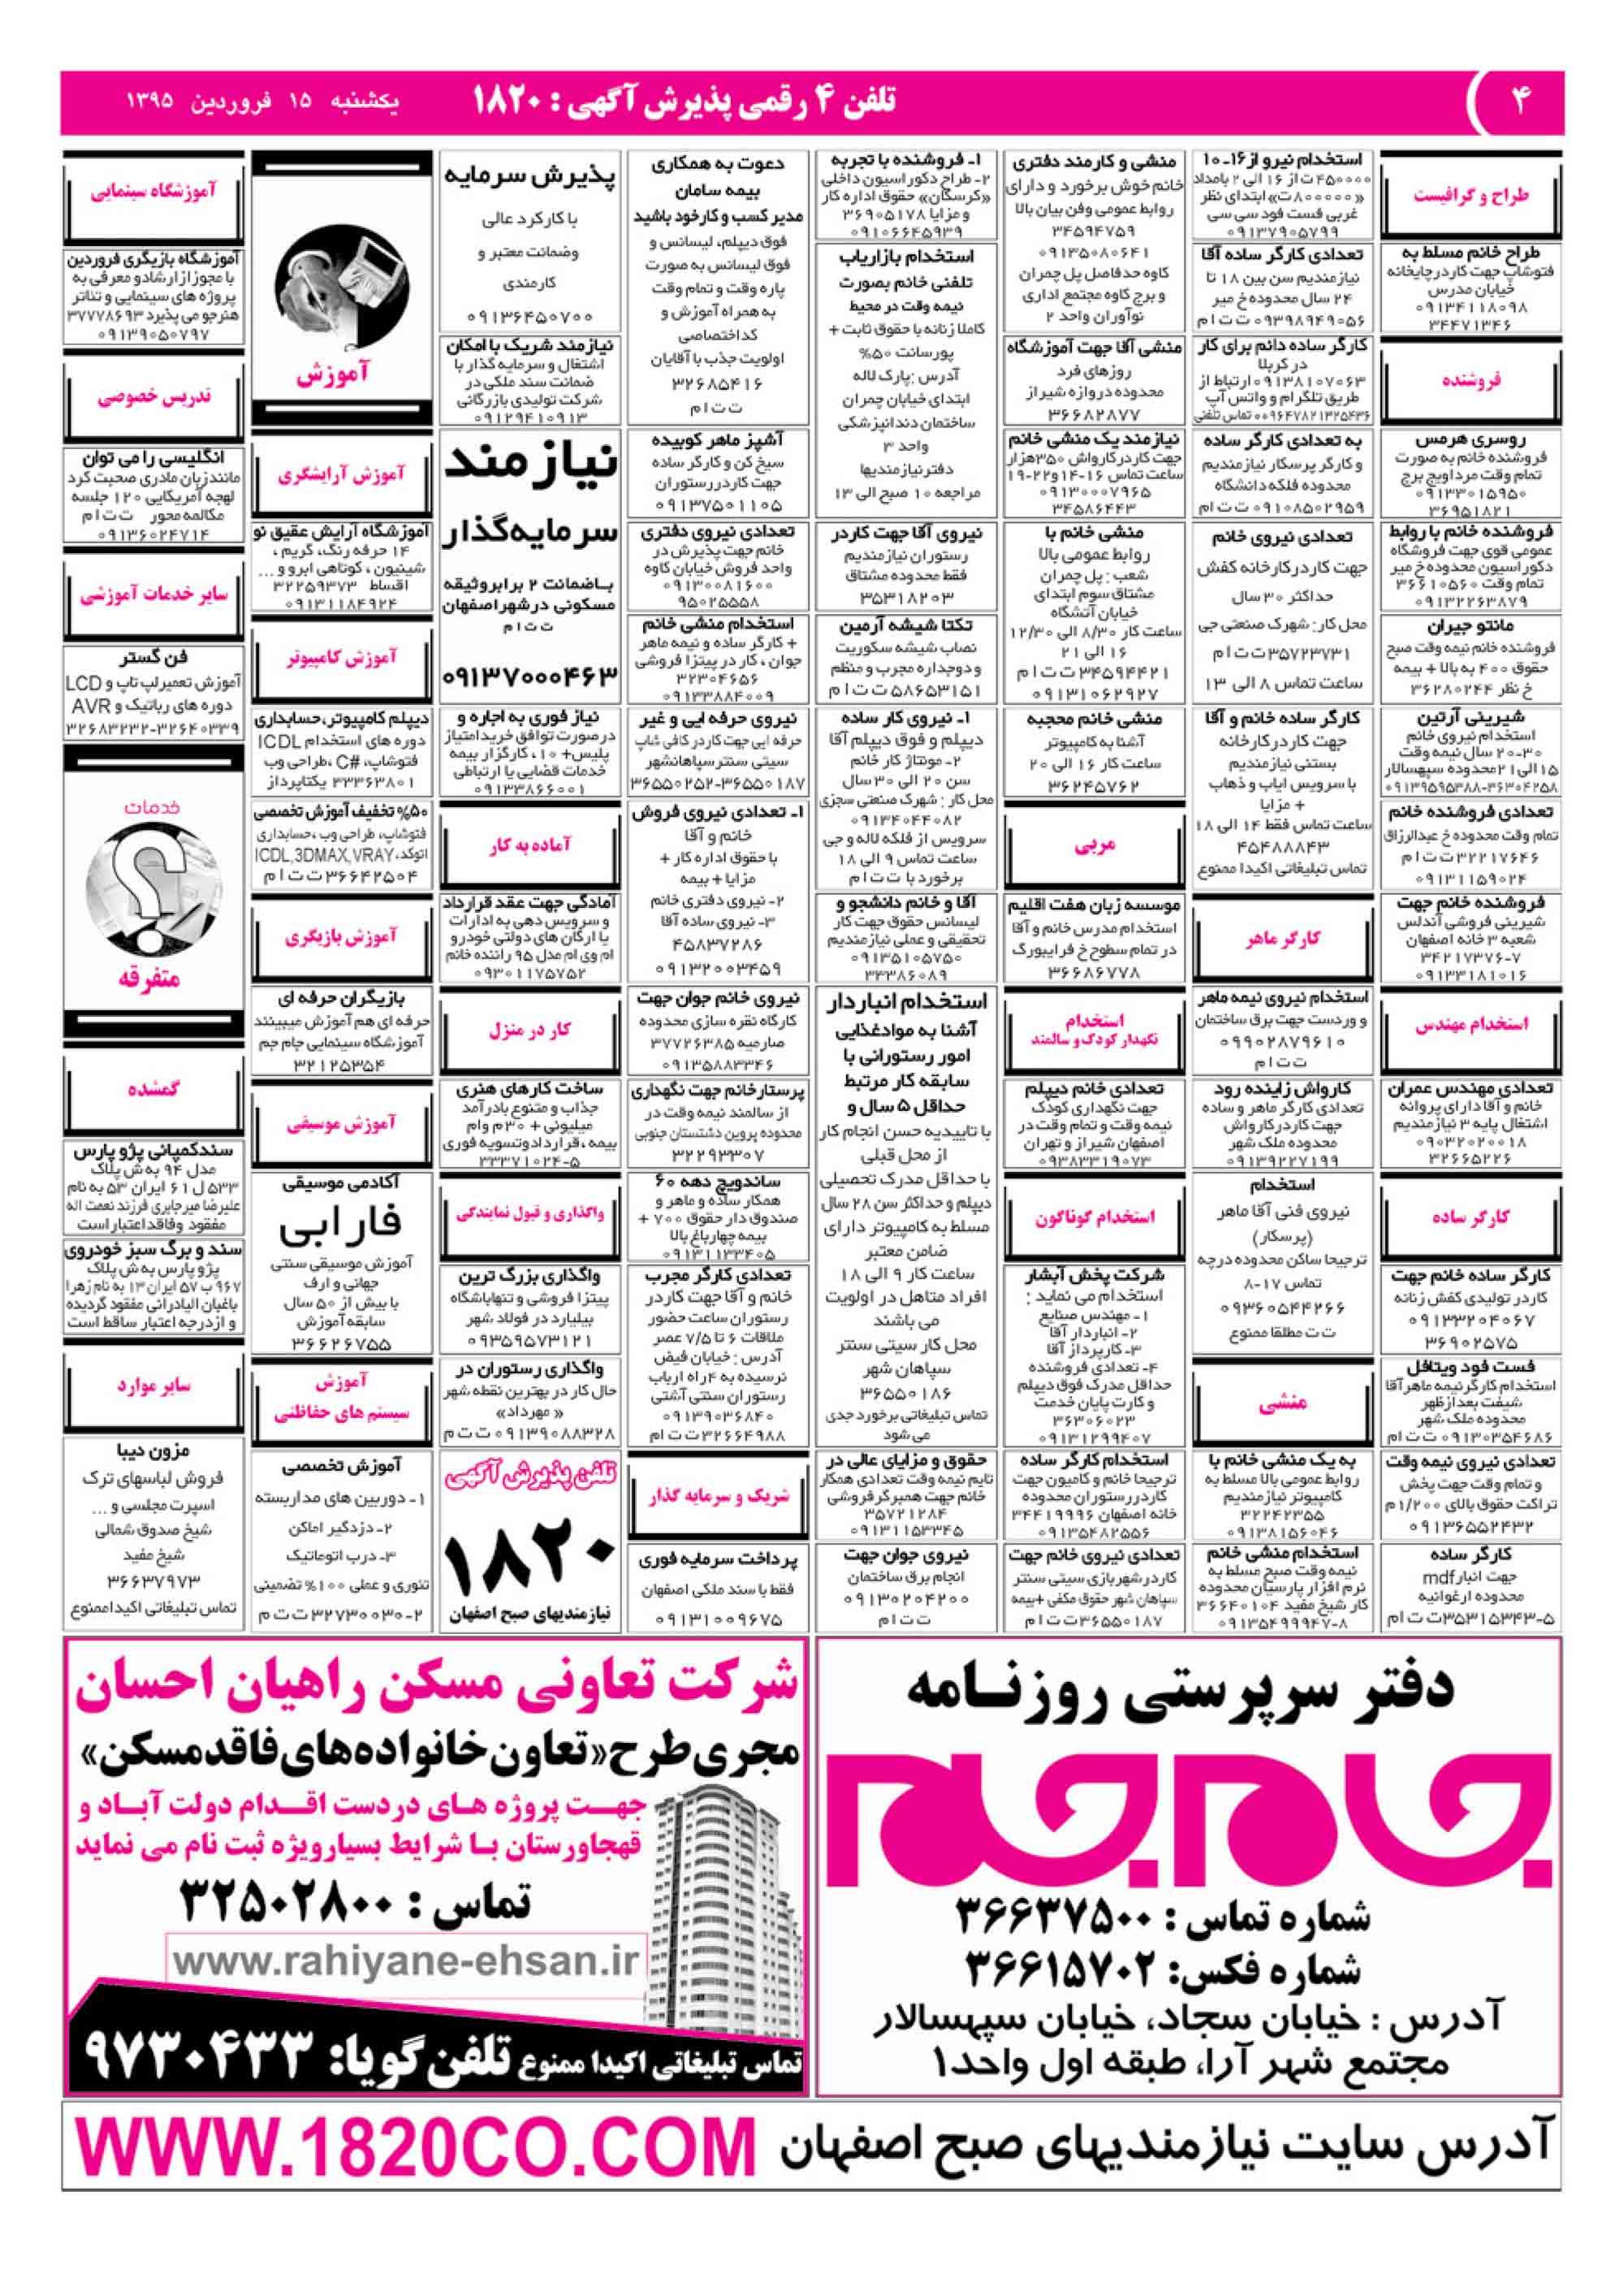 Image result for استخدامی اصفهان